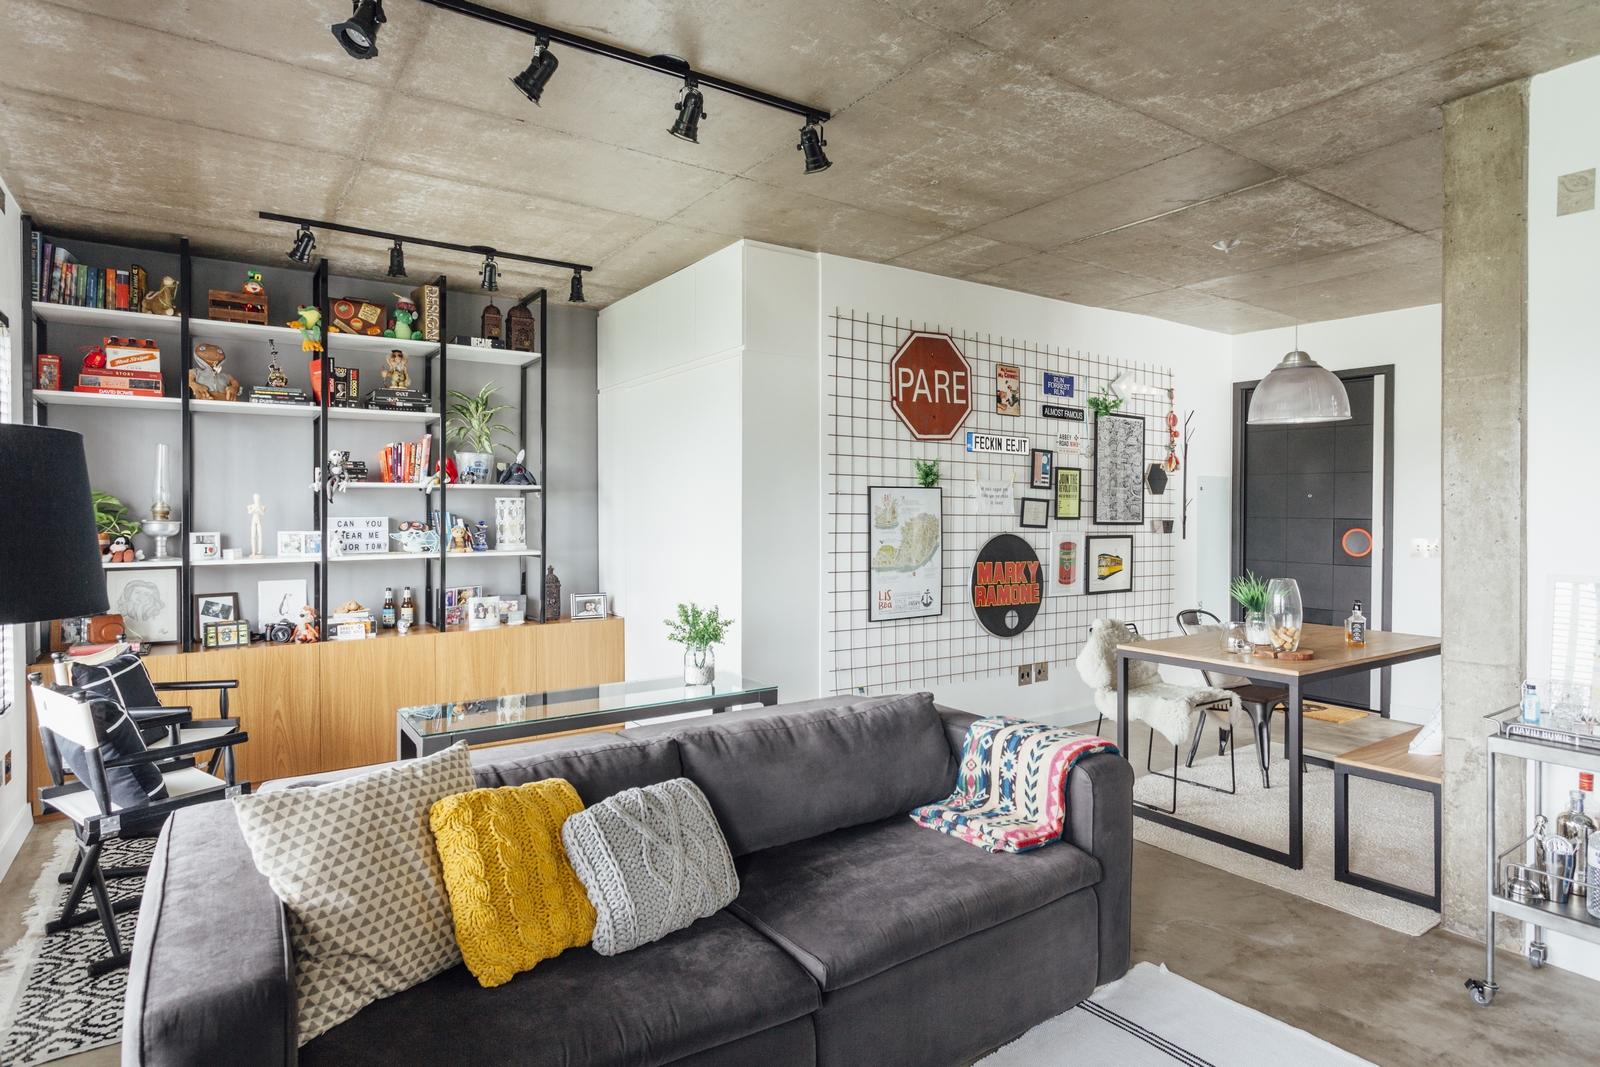 Apartamento Maxhaus -19 (Copiar)